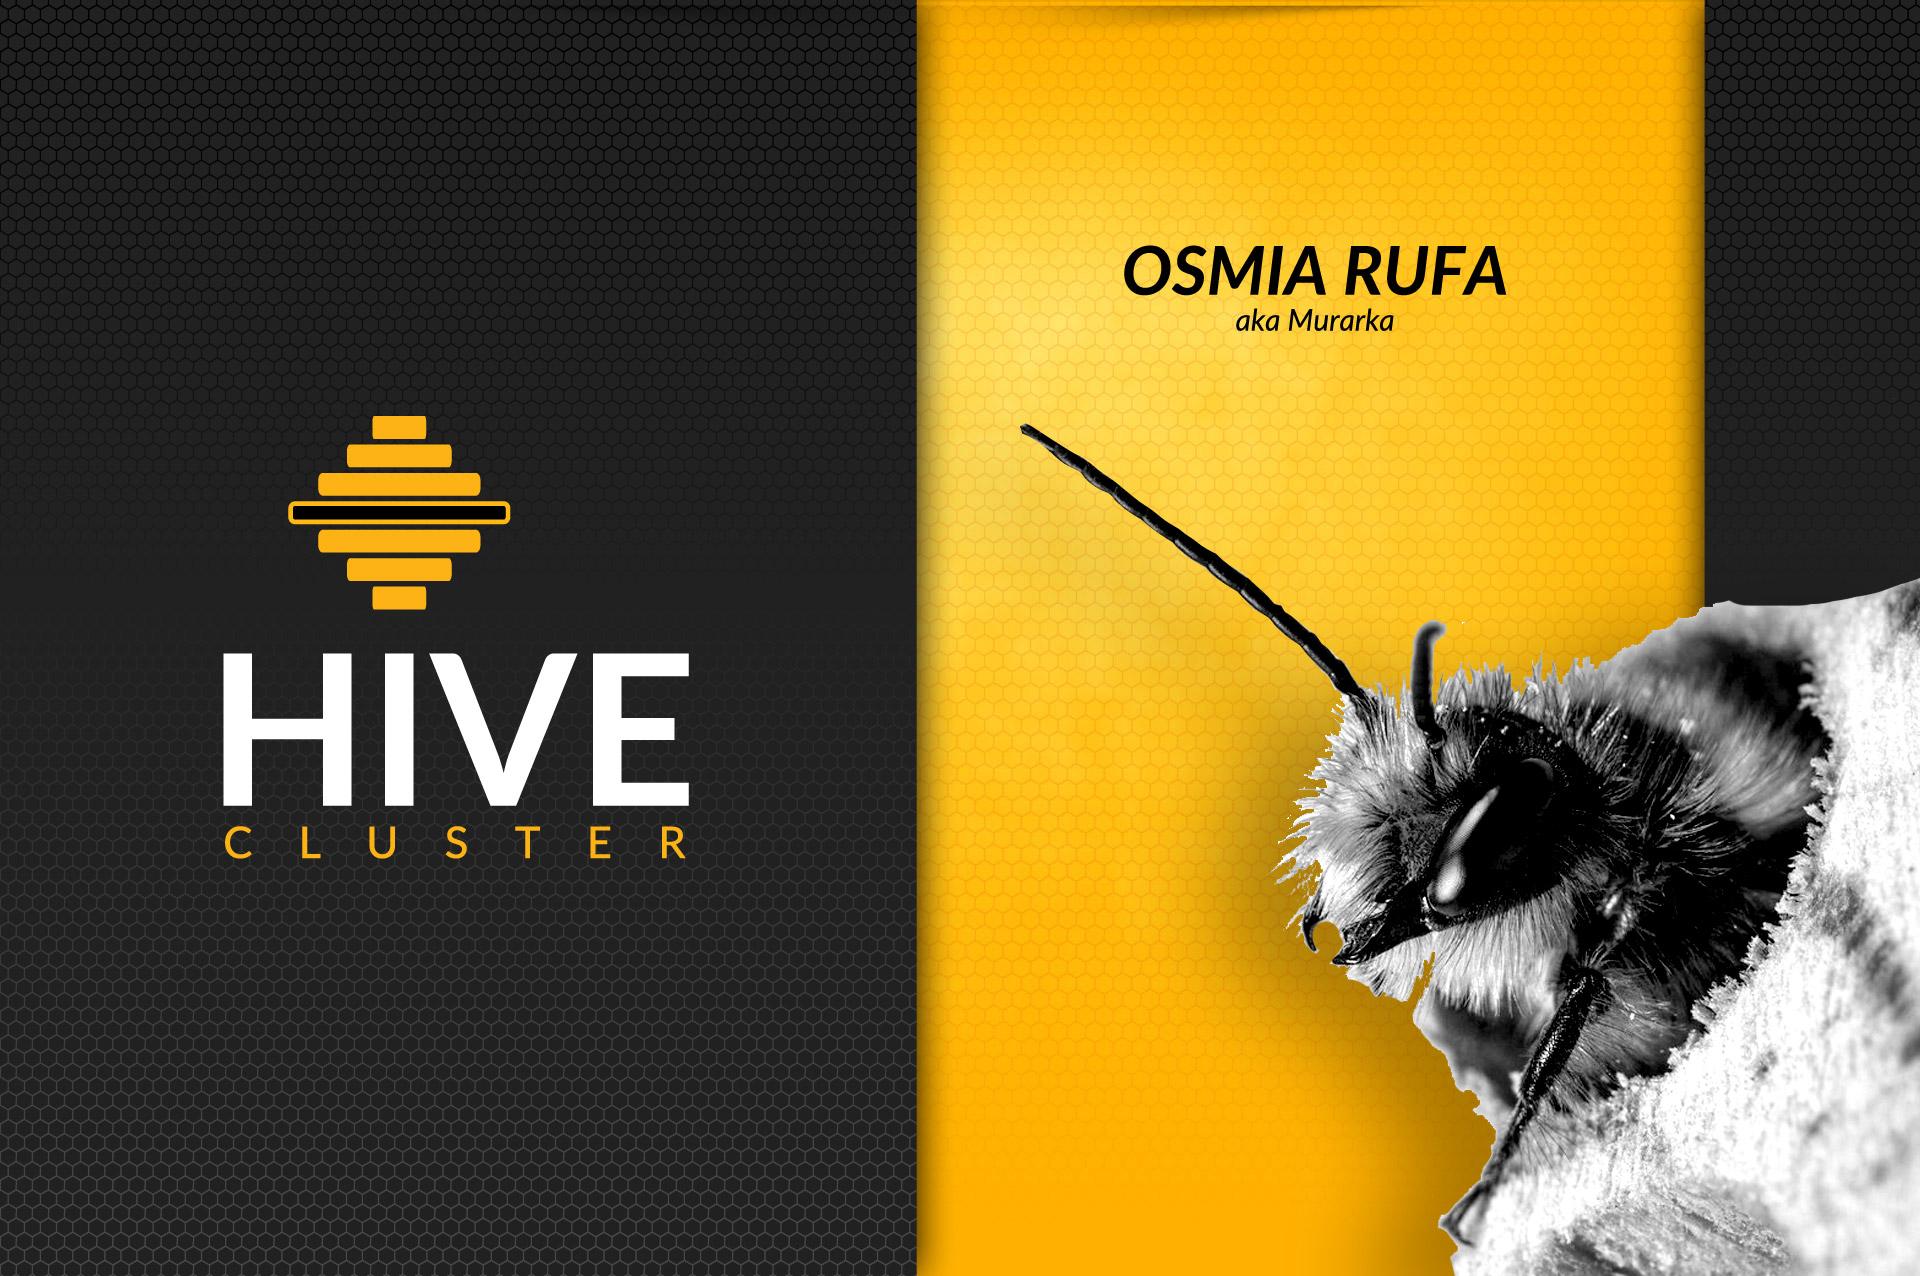 osmia rufa - murarka hive cluster